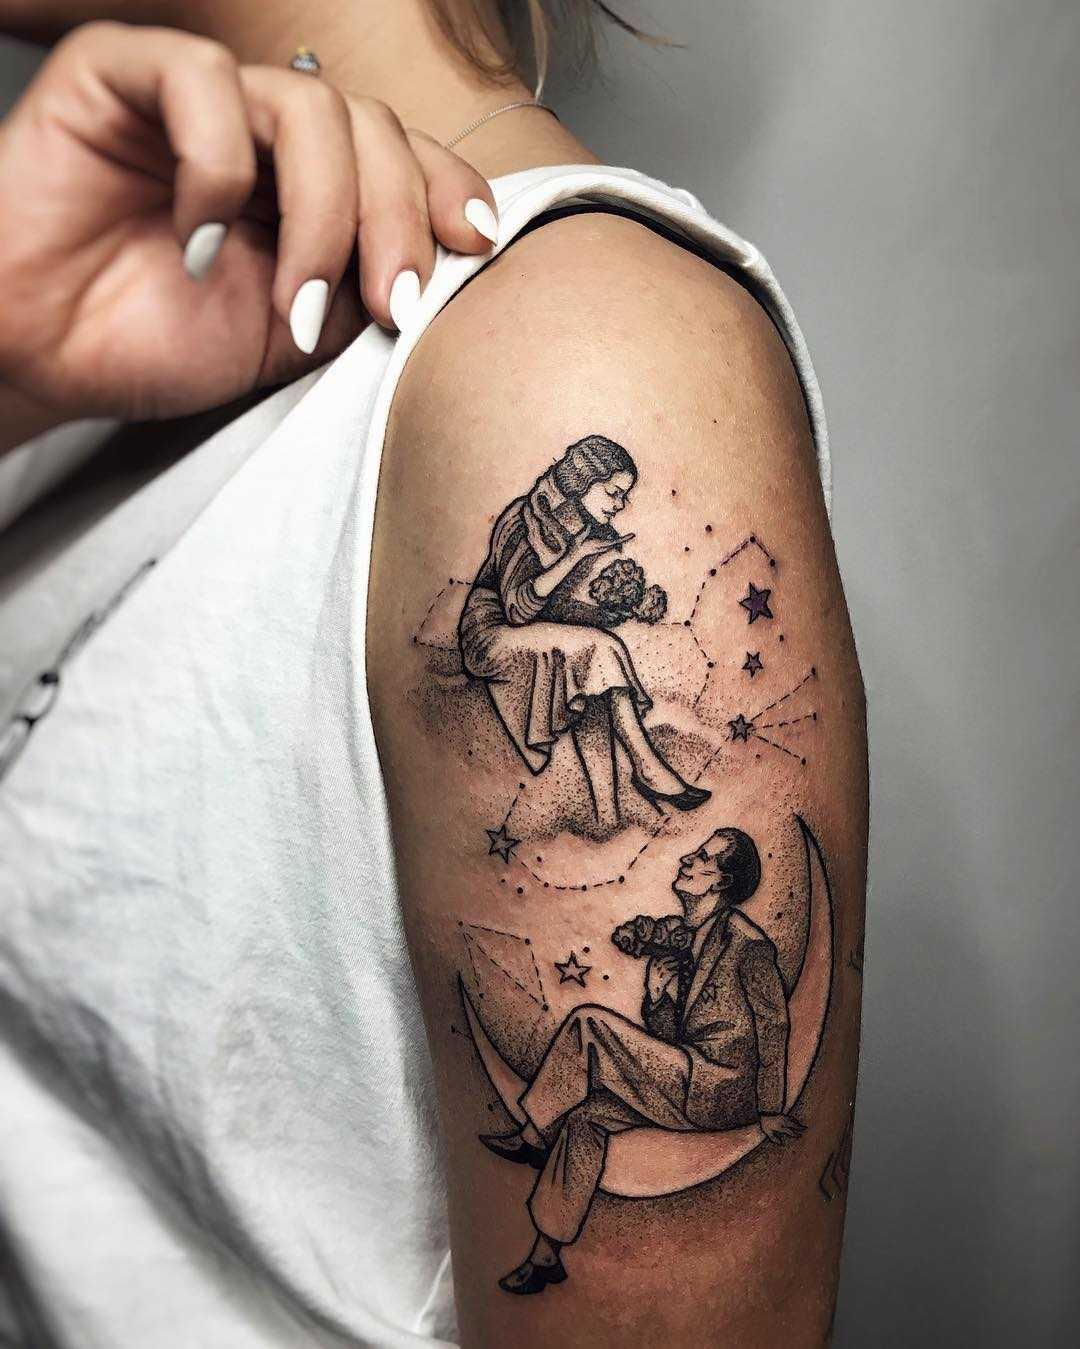 Lovers tattoo by Sasha Tattooing